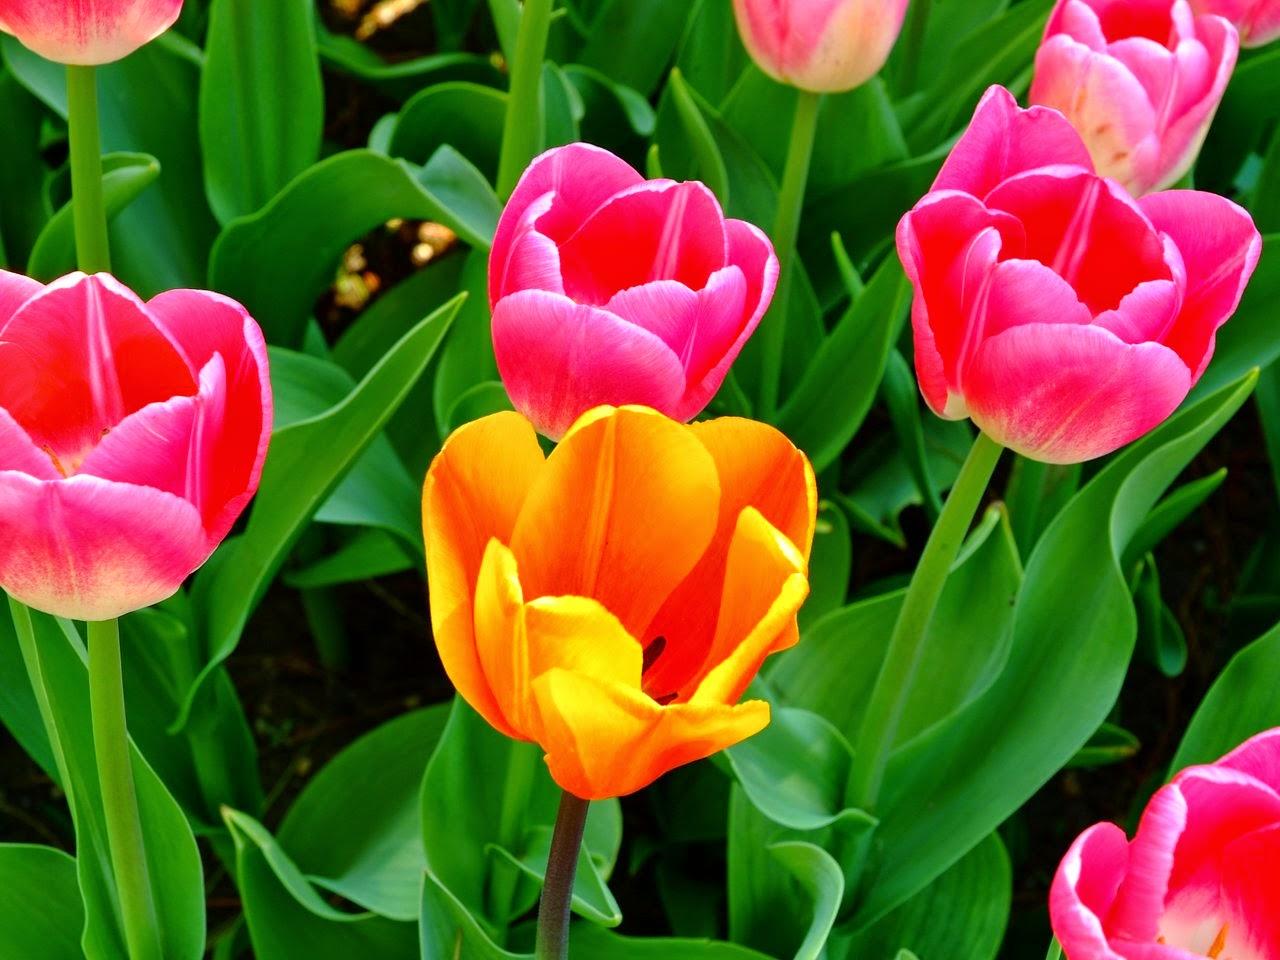 cute tulips pink flowers - photo #4